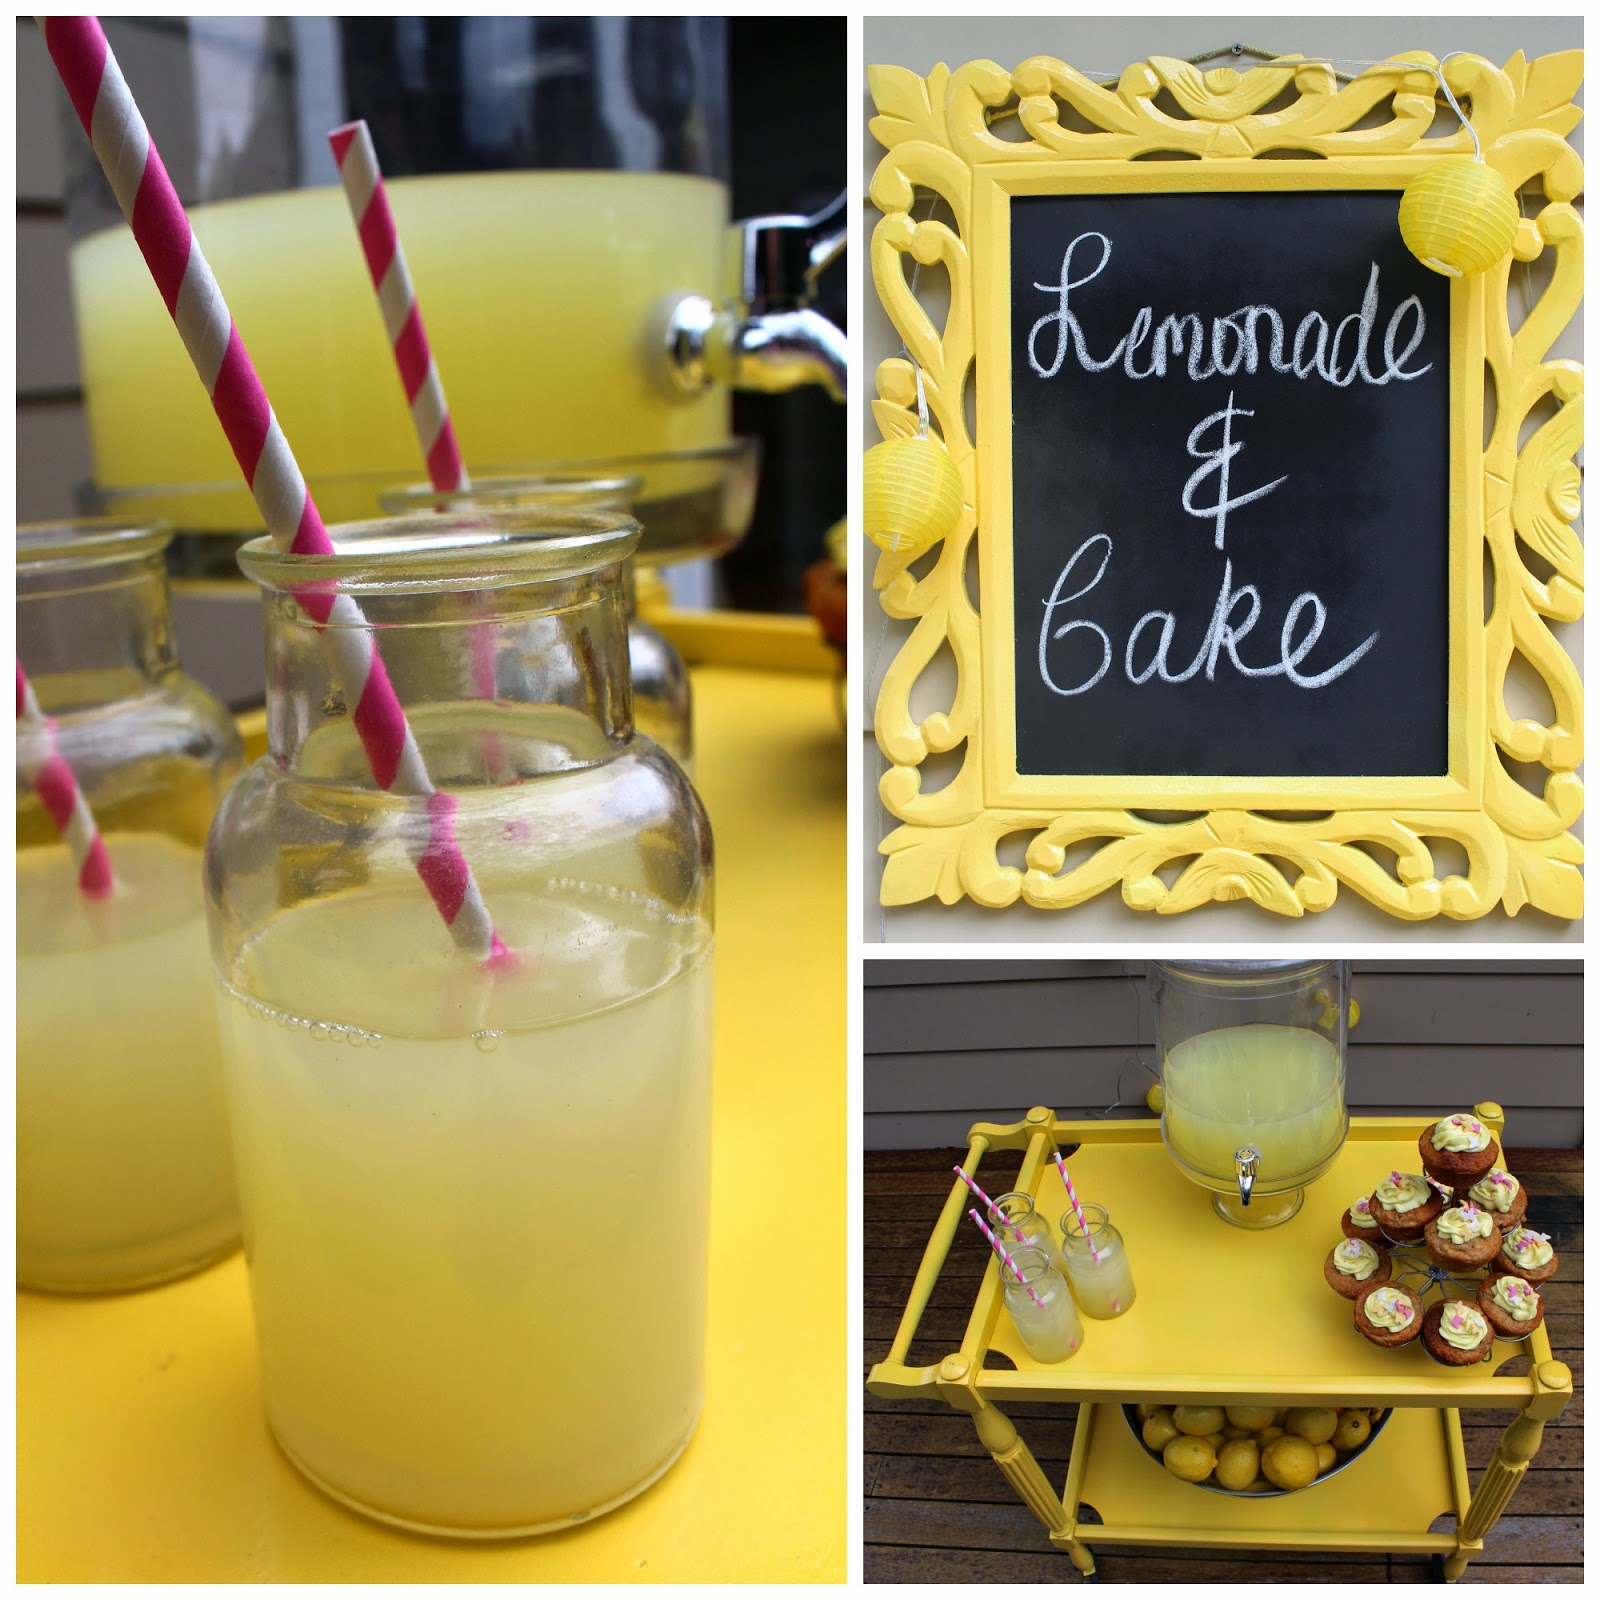 how to make a lemonade stand easy